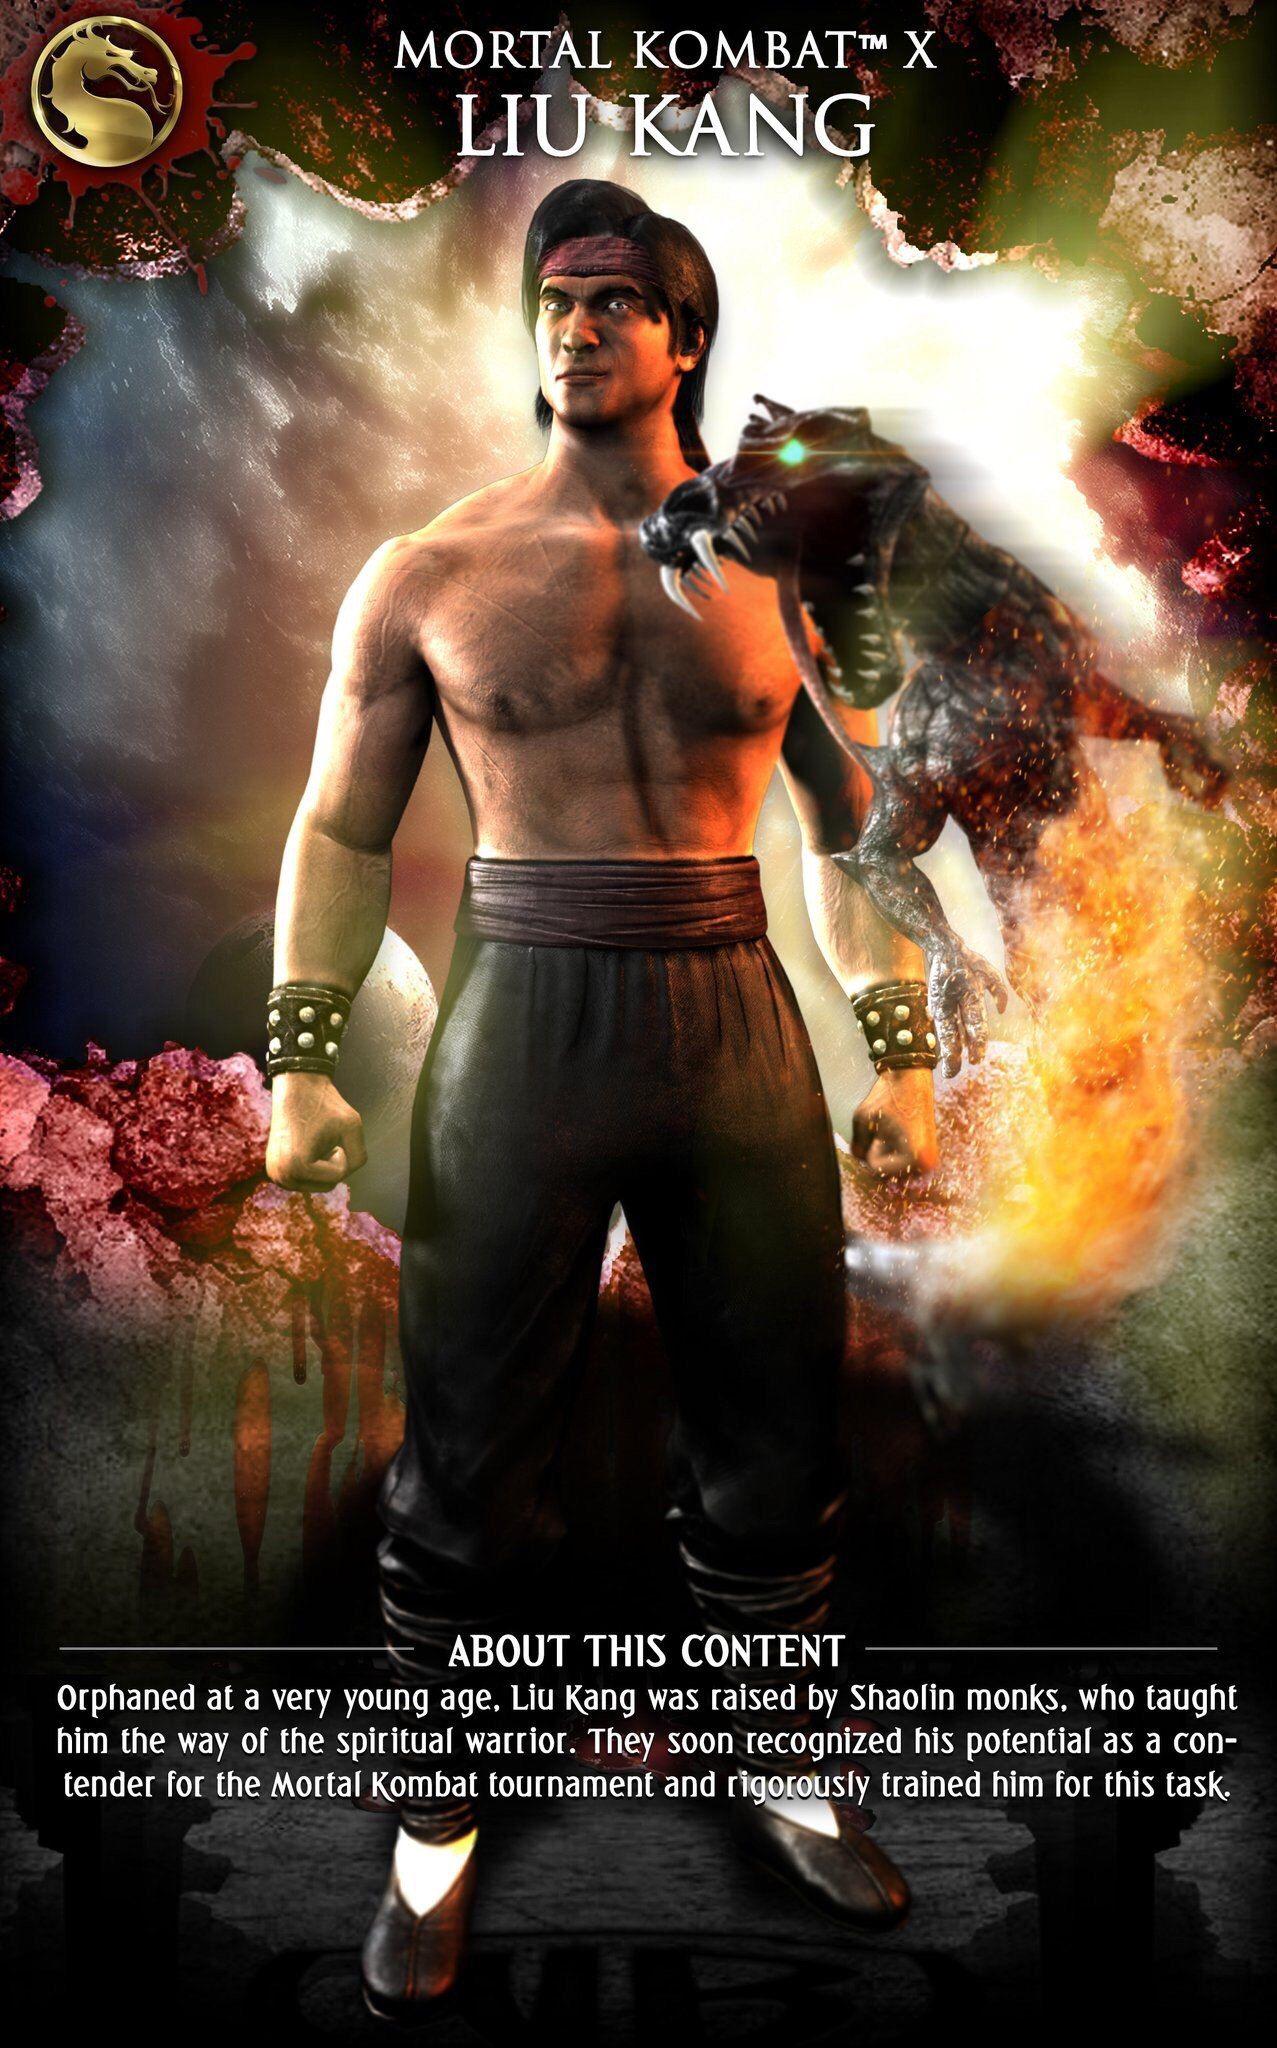 Mortal kombat x mobile mortal kombat characters mortal